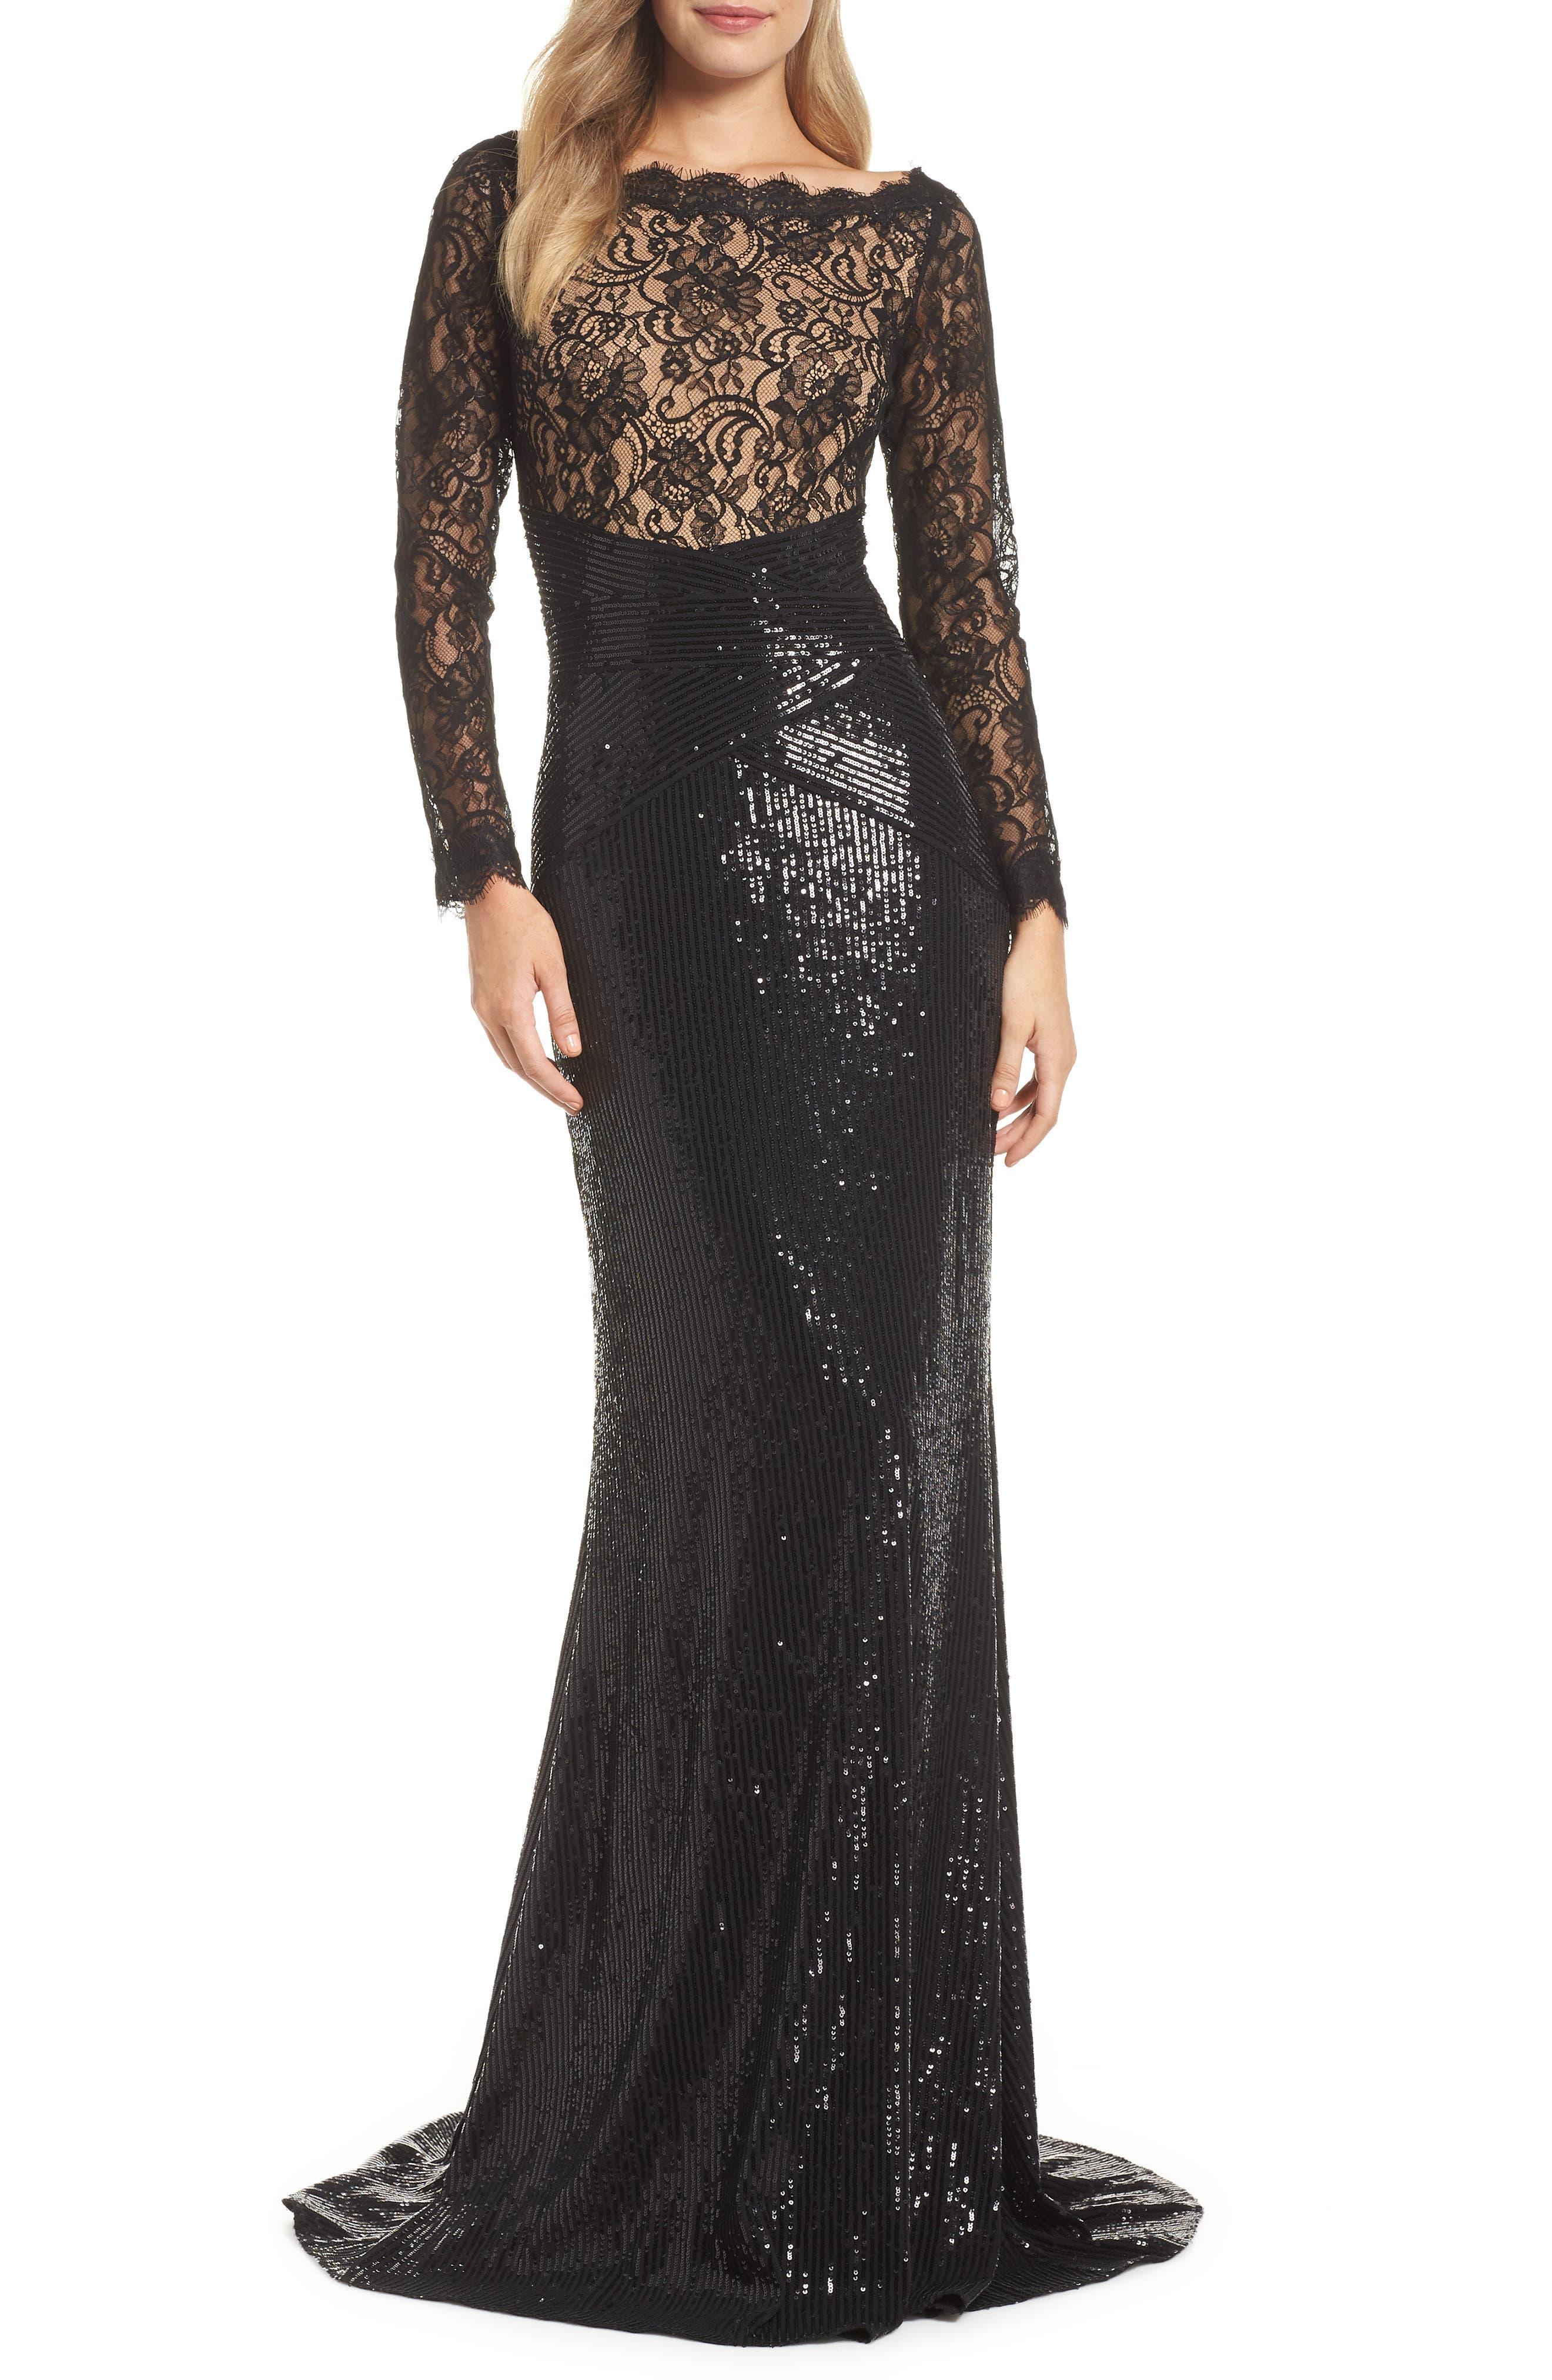 Tadashi Shoji Lace & Sequin Gown, Black